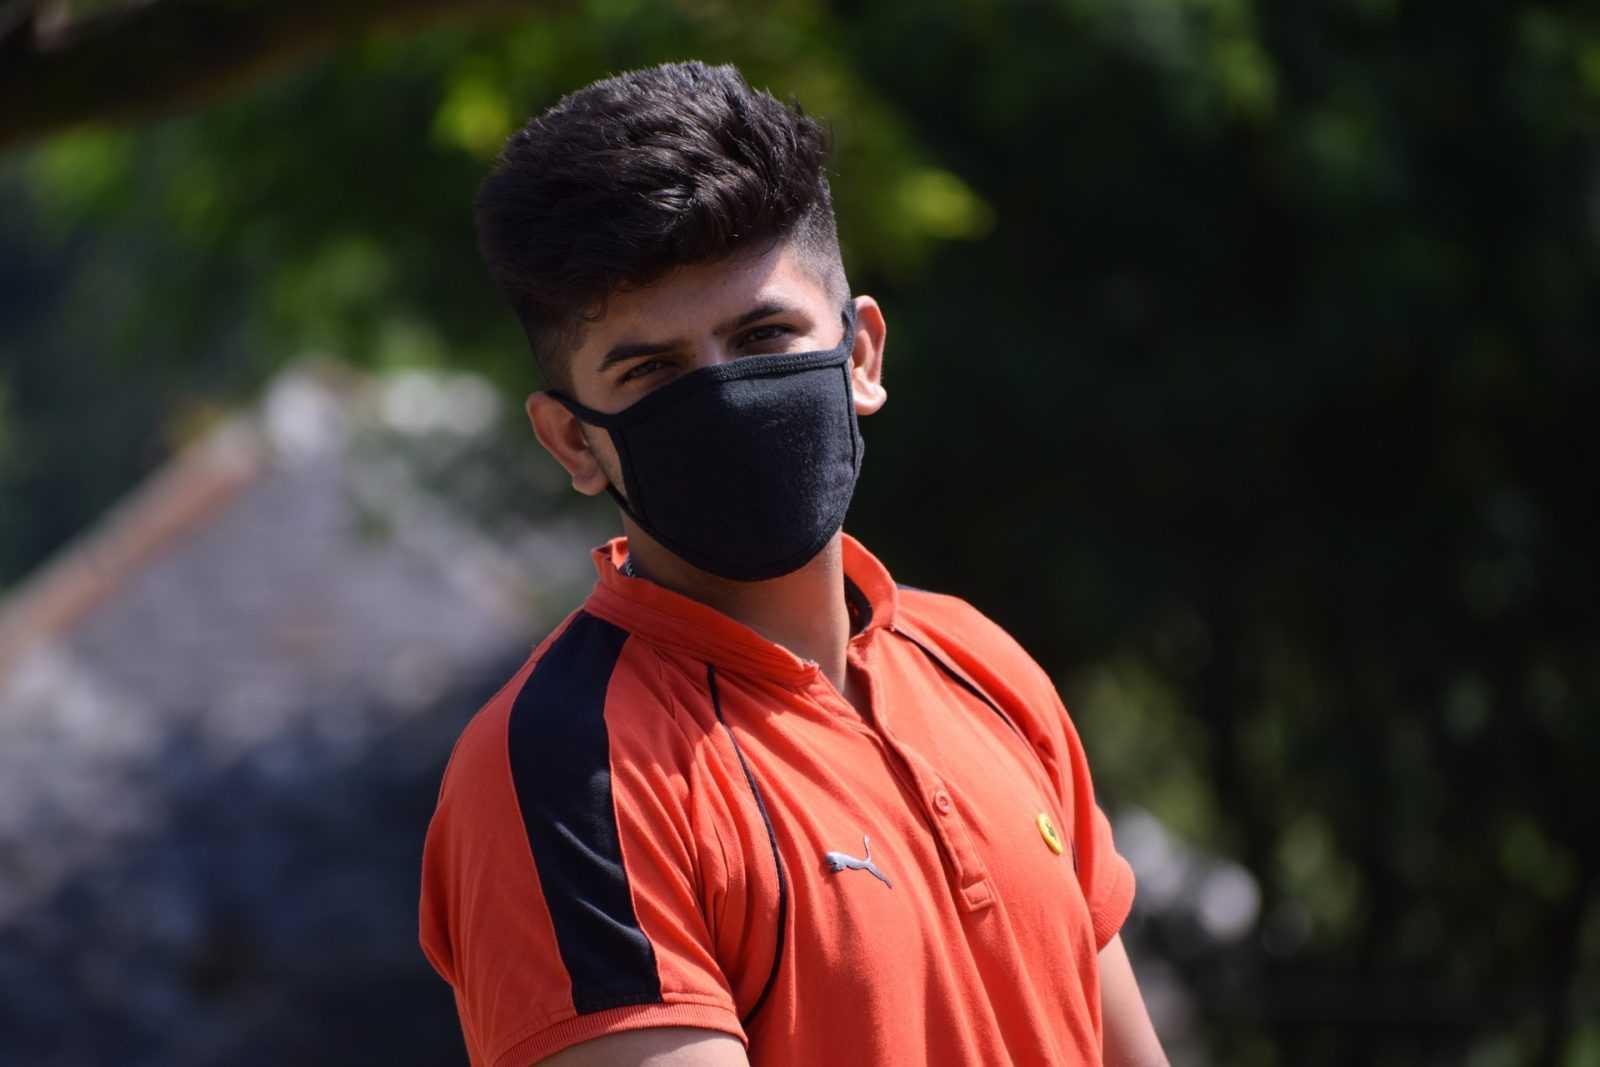 smog maski antysmogowe miasto przeciwsmogowe respro zima (11)